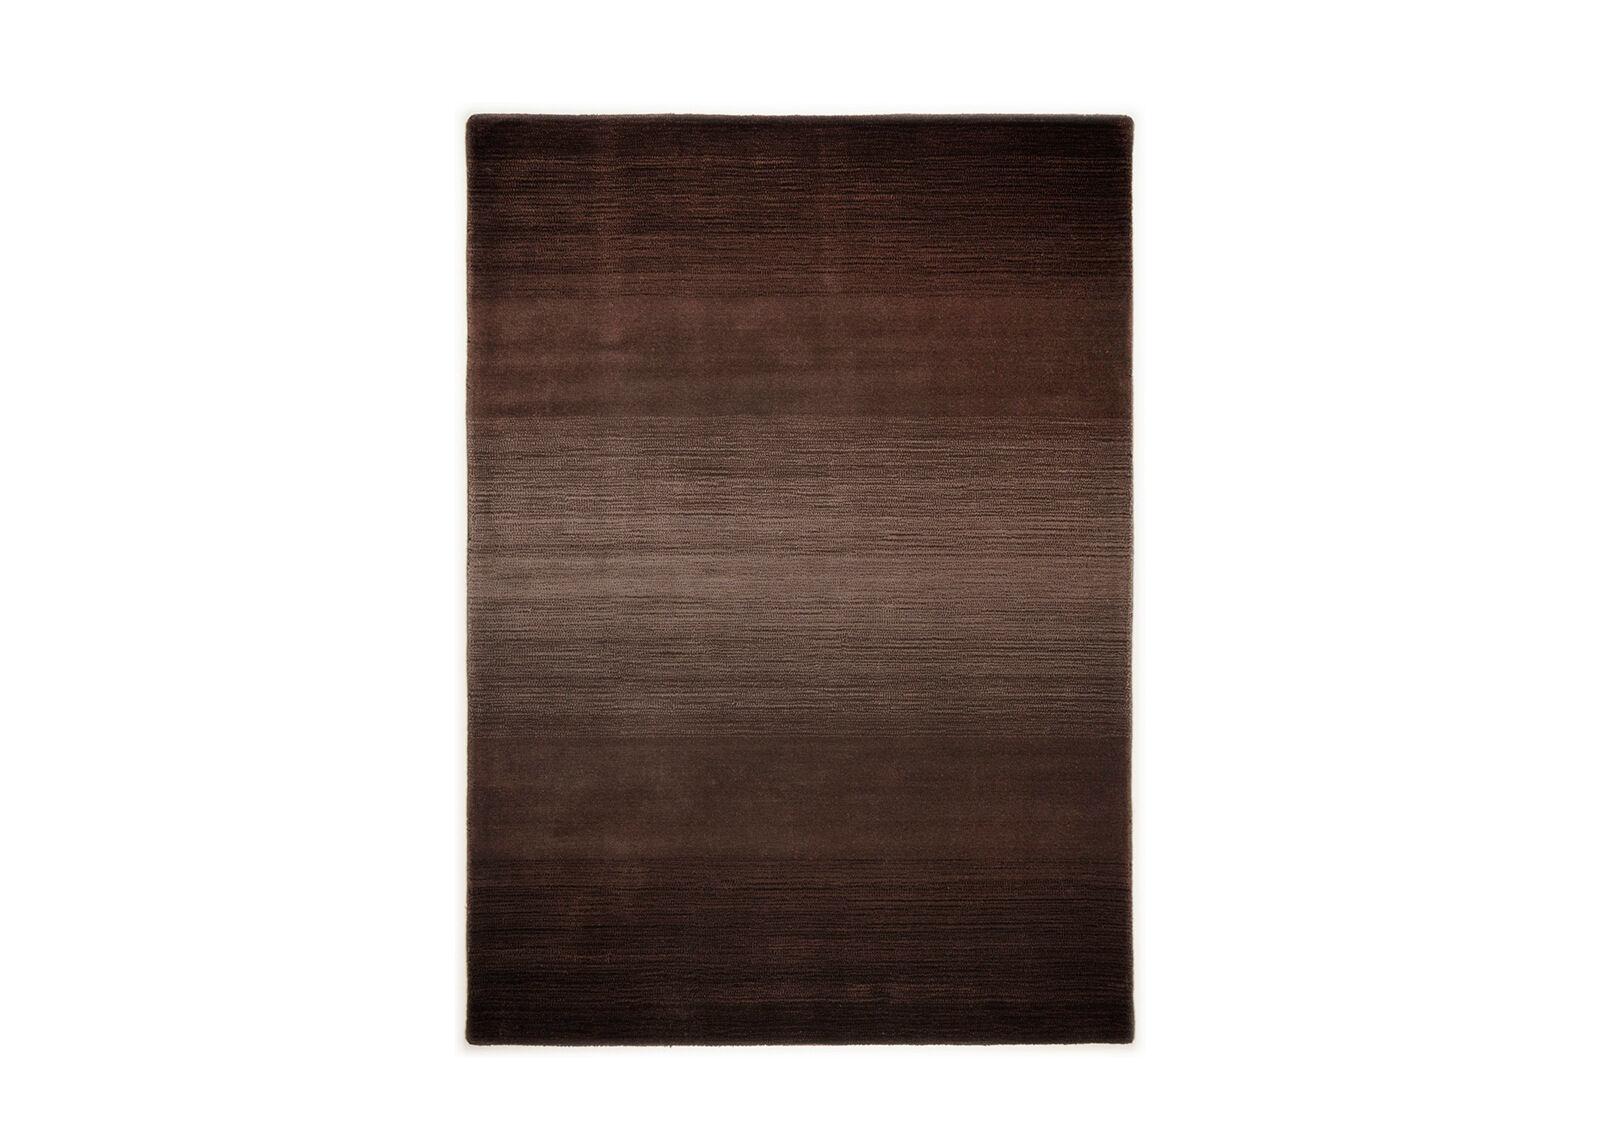 Image of Theko Villamatto Wool Comfort 160x230 cm